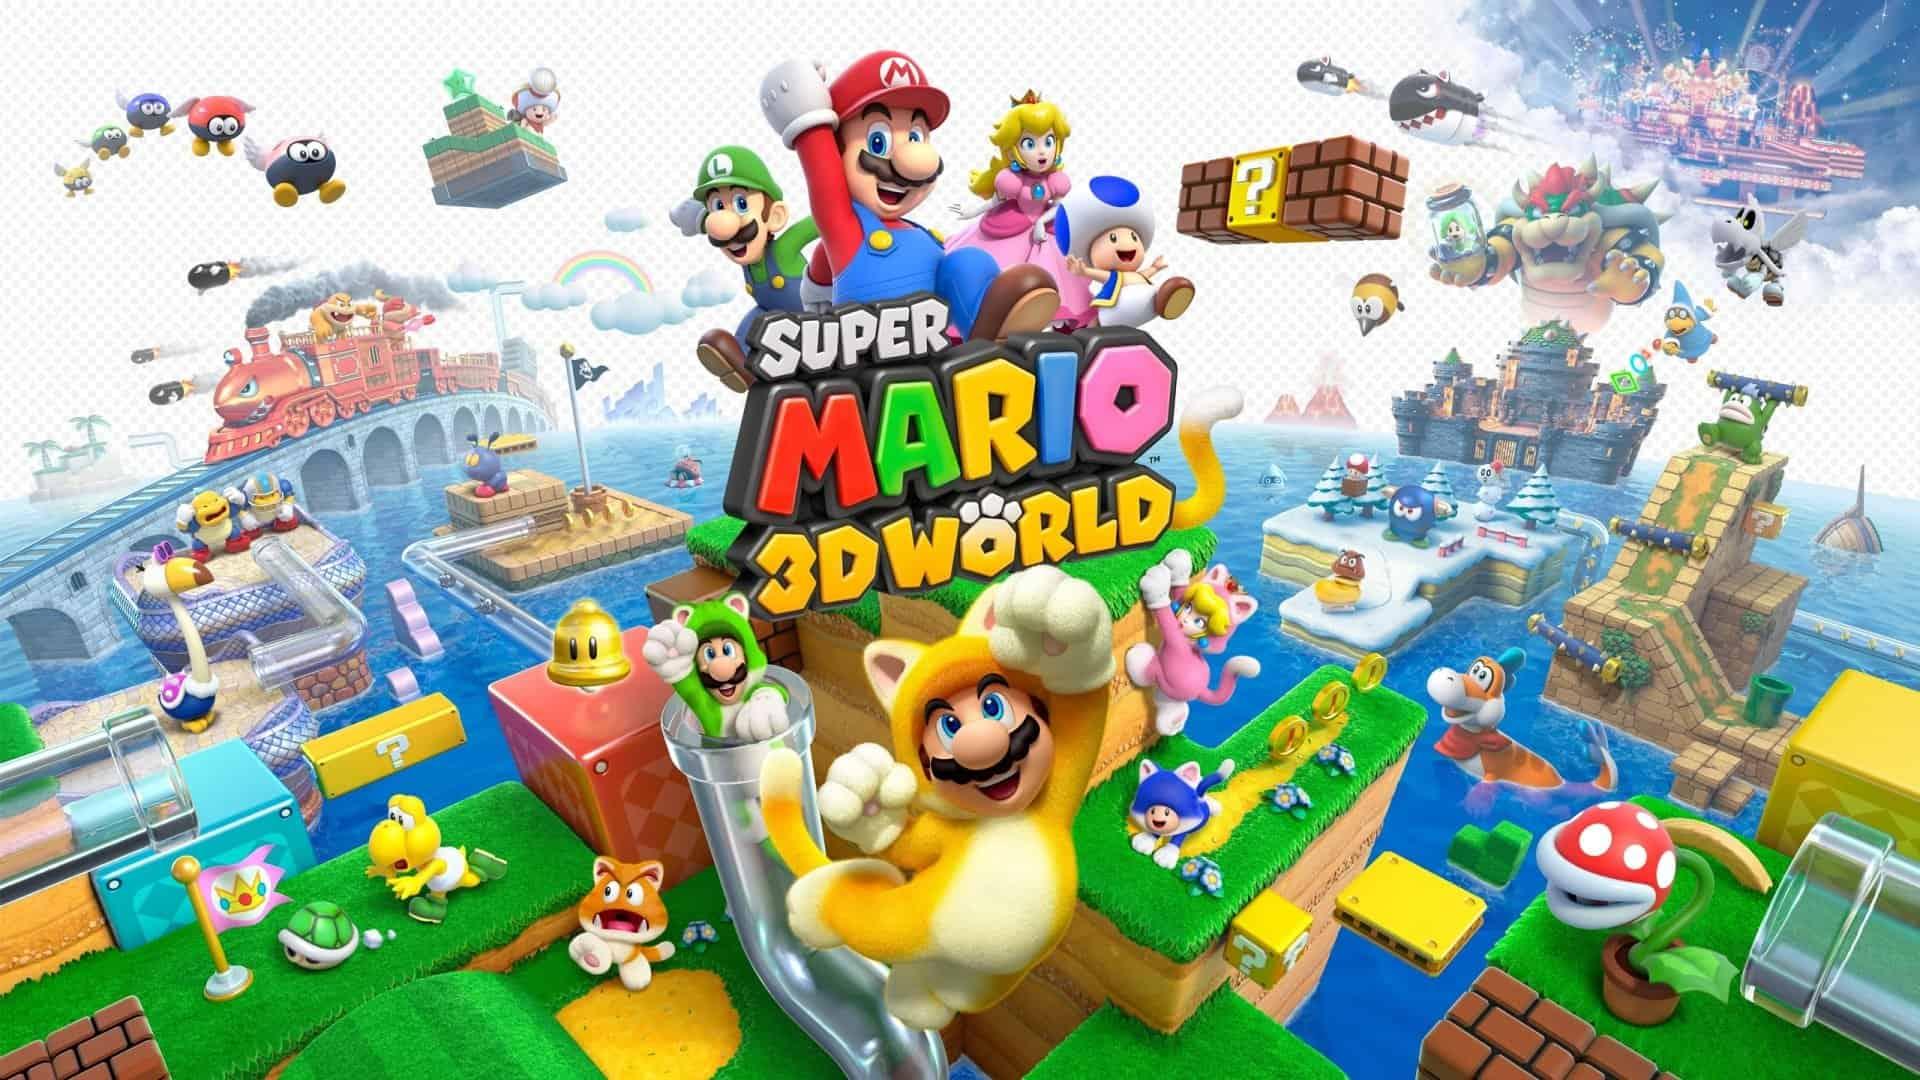 Best Super Mario Games - 3D World